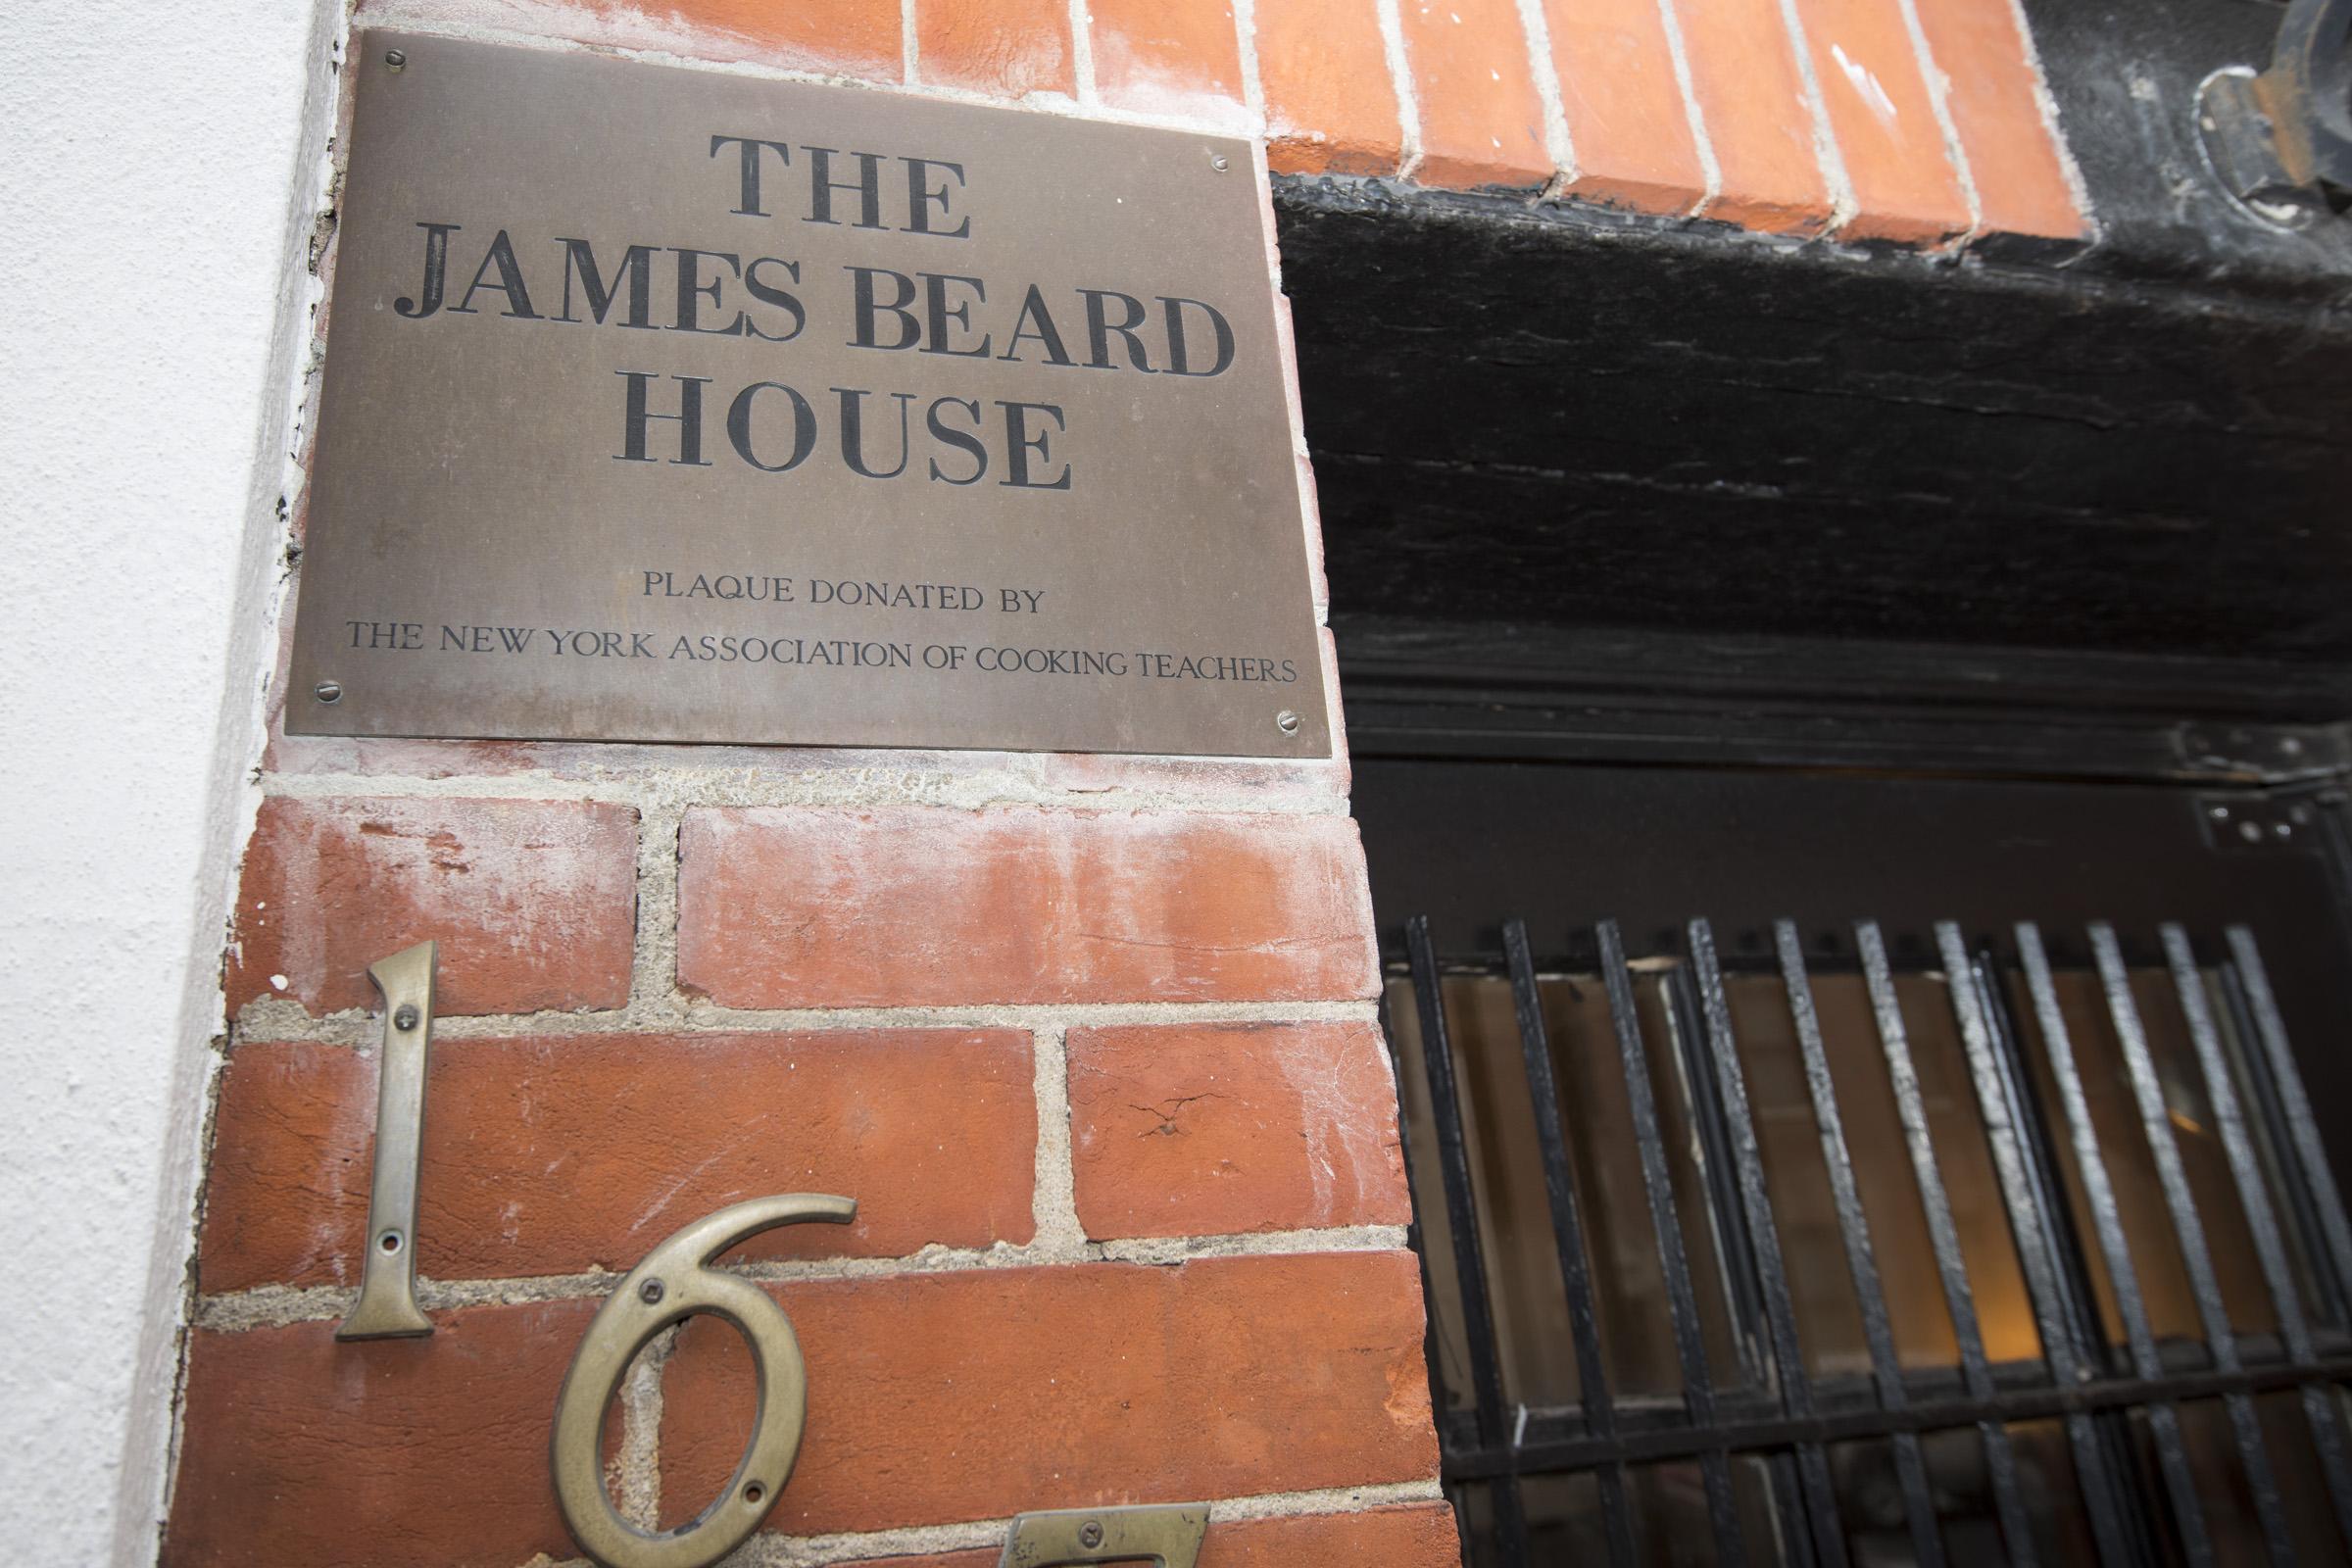 James Beard House.